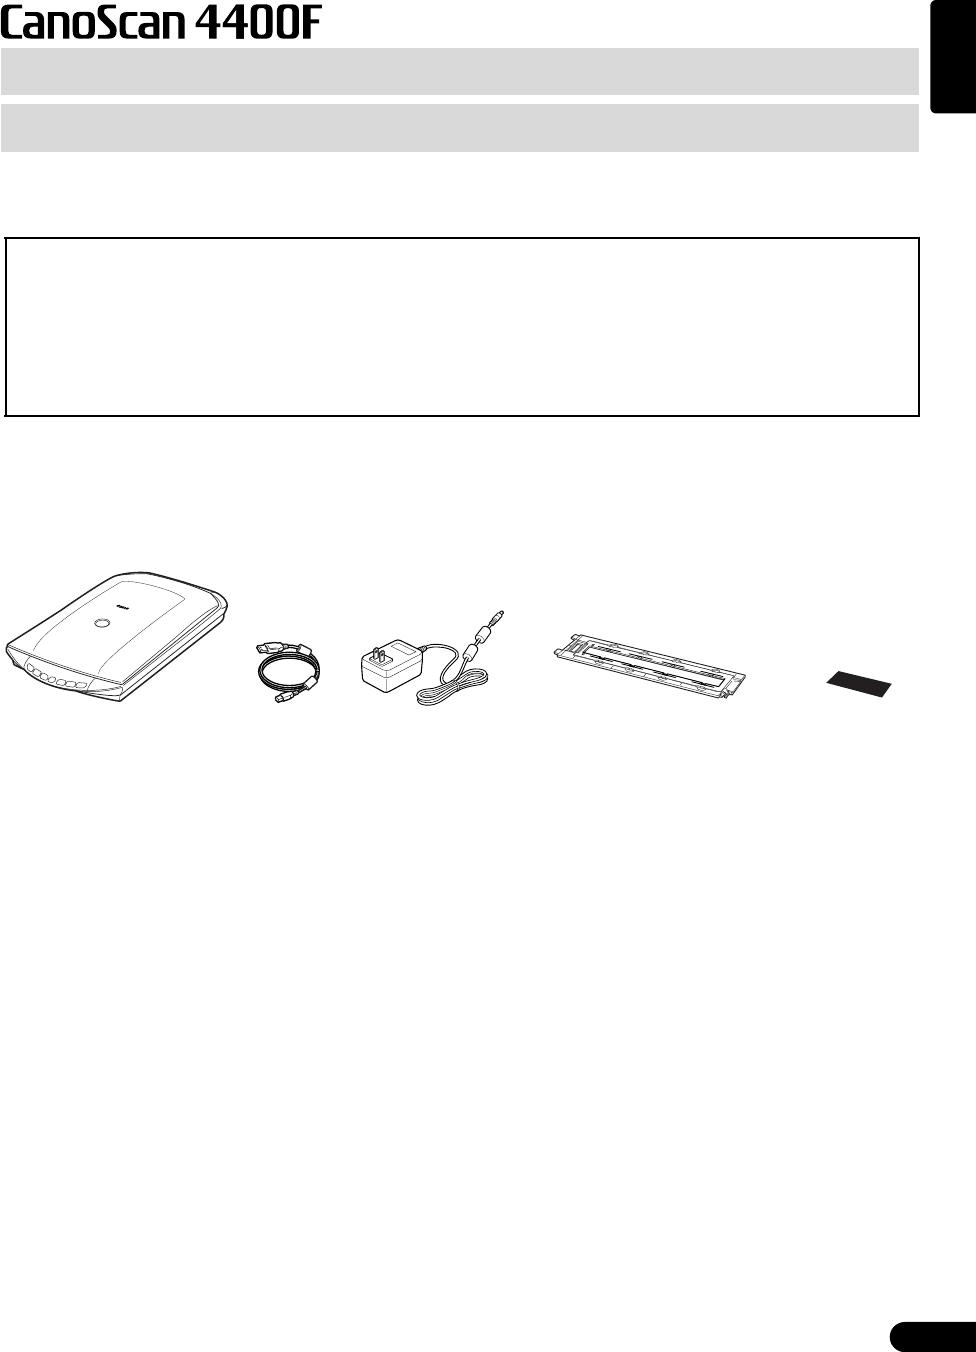 canoscan 4400f toolbox download windows 7